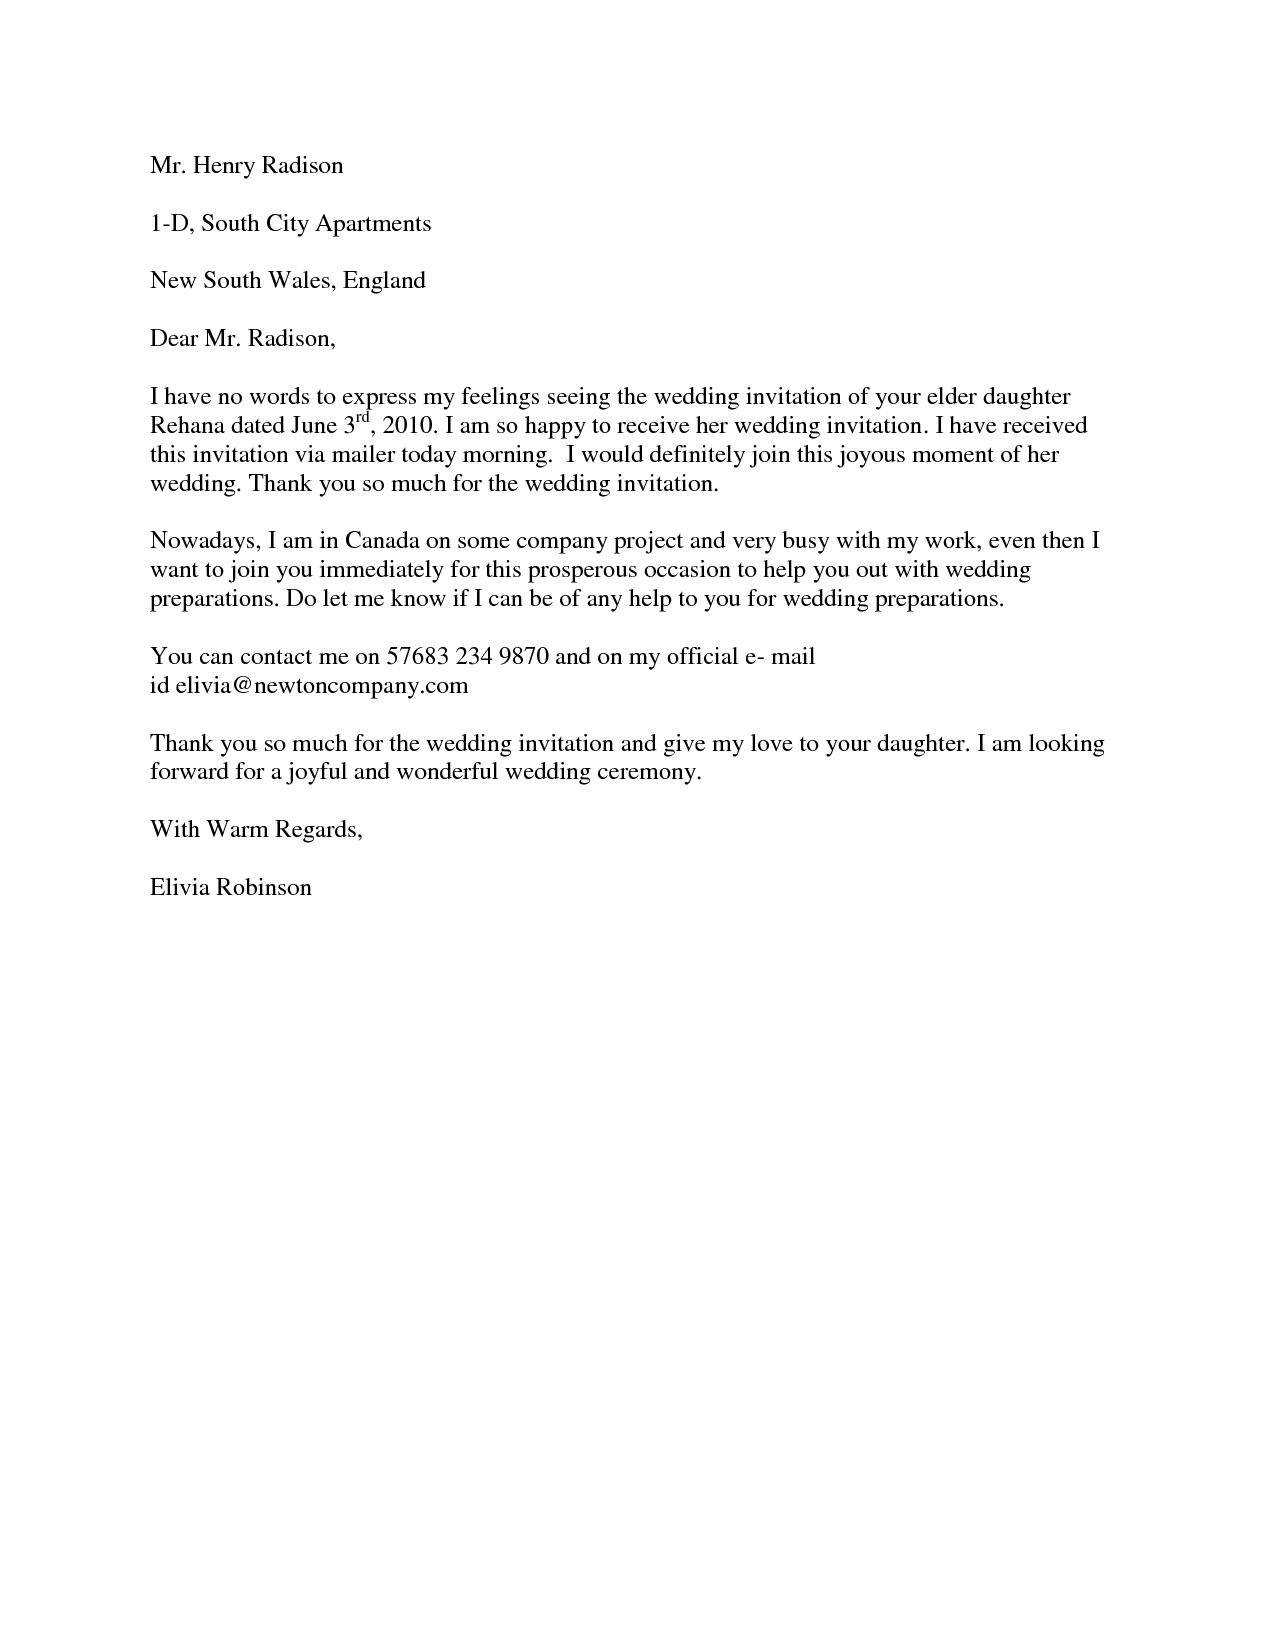 formal wedding acceptance letter in